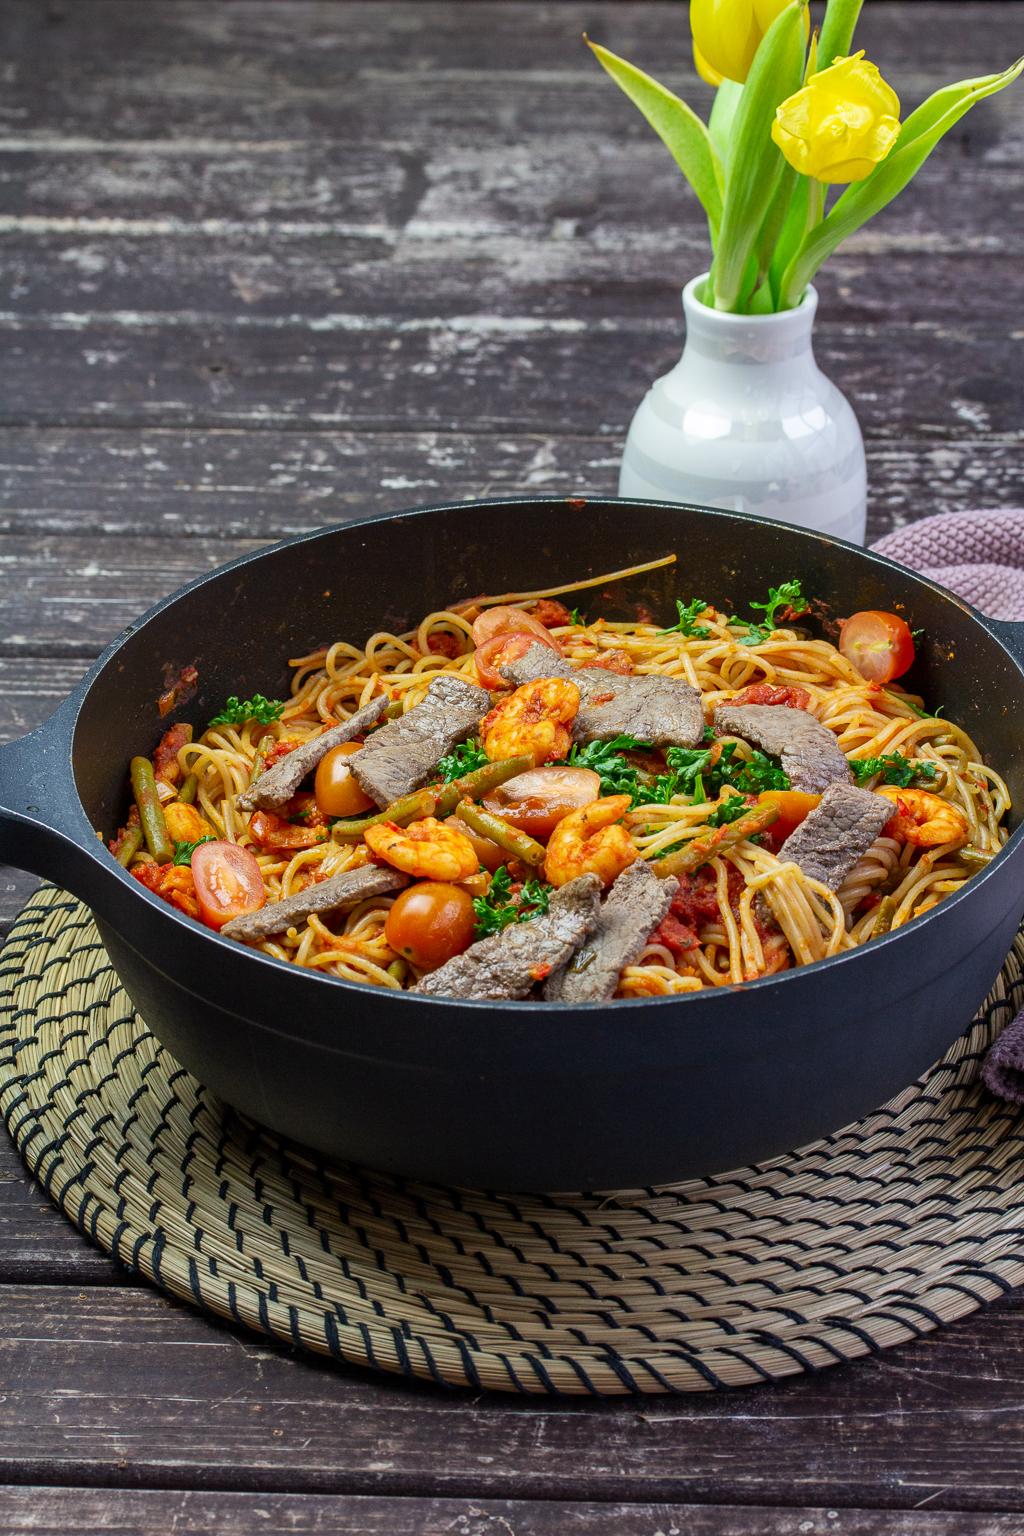 Oberleckere Spaghetti in Tomatensoße